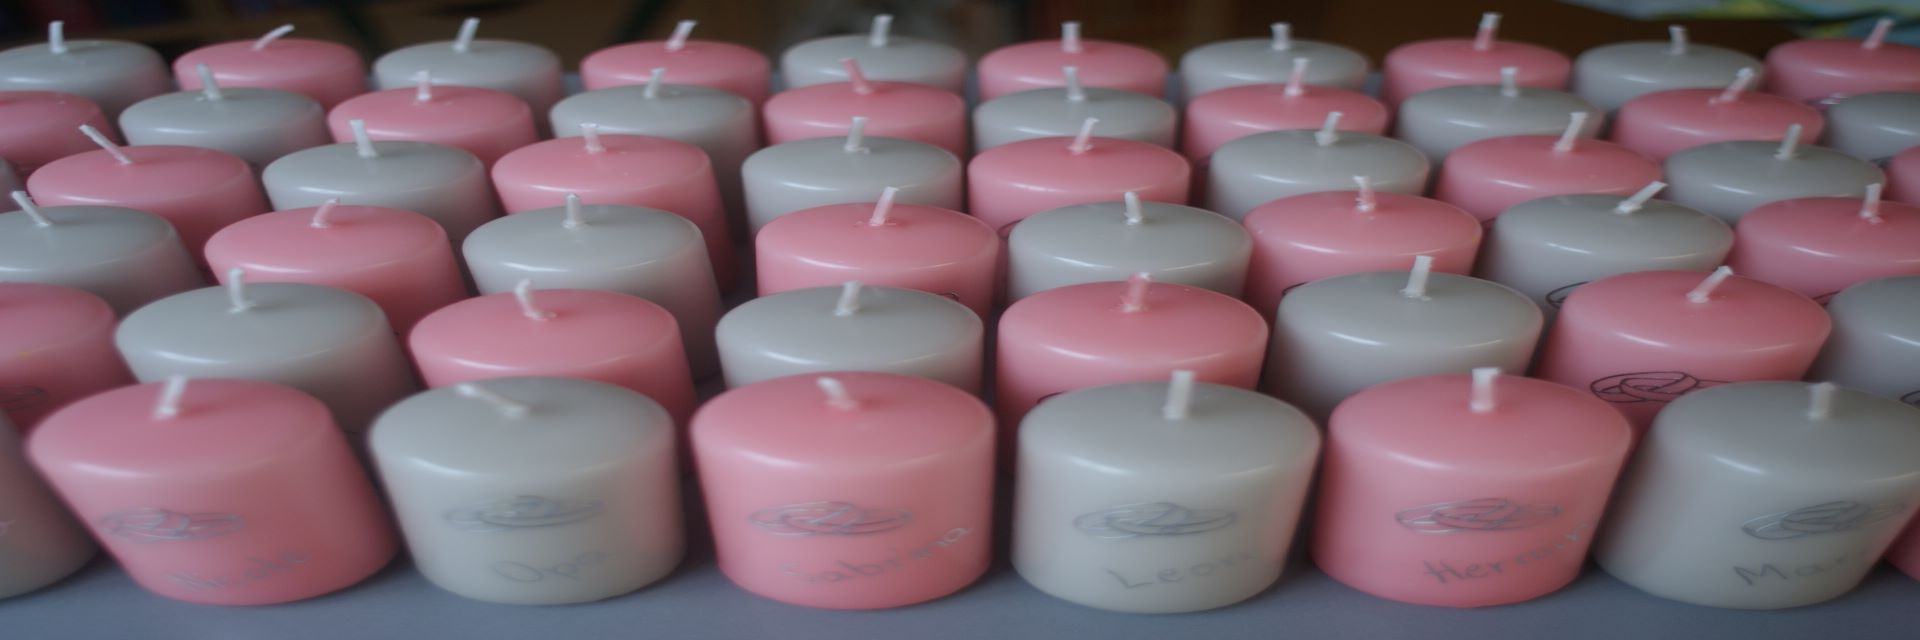 Kerzen auch als Tischkarte